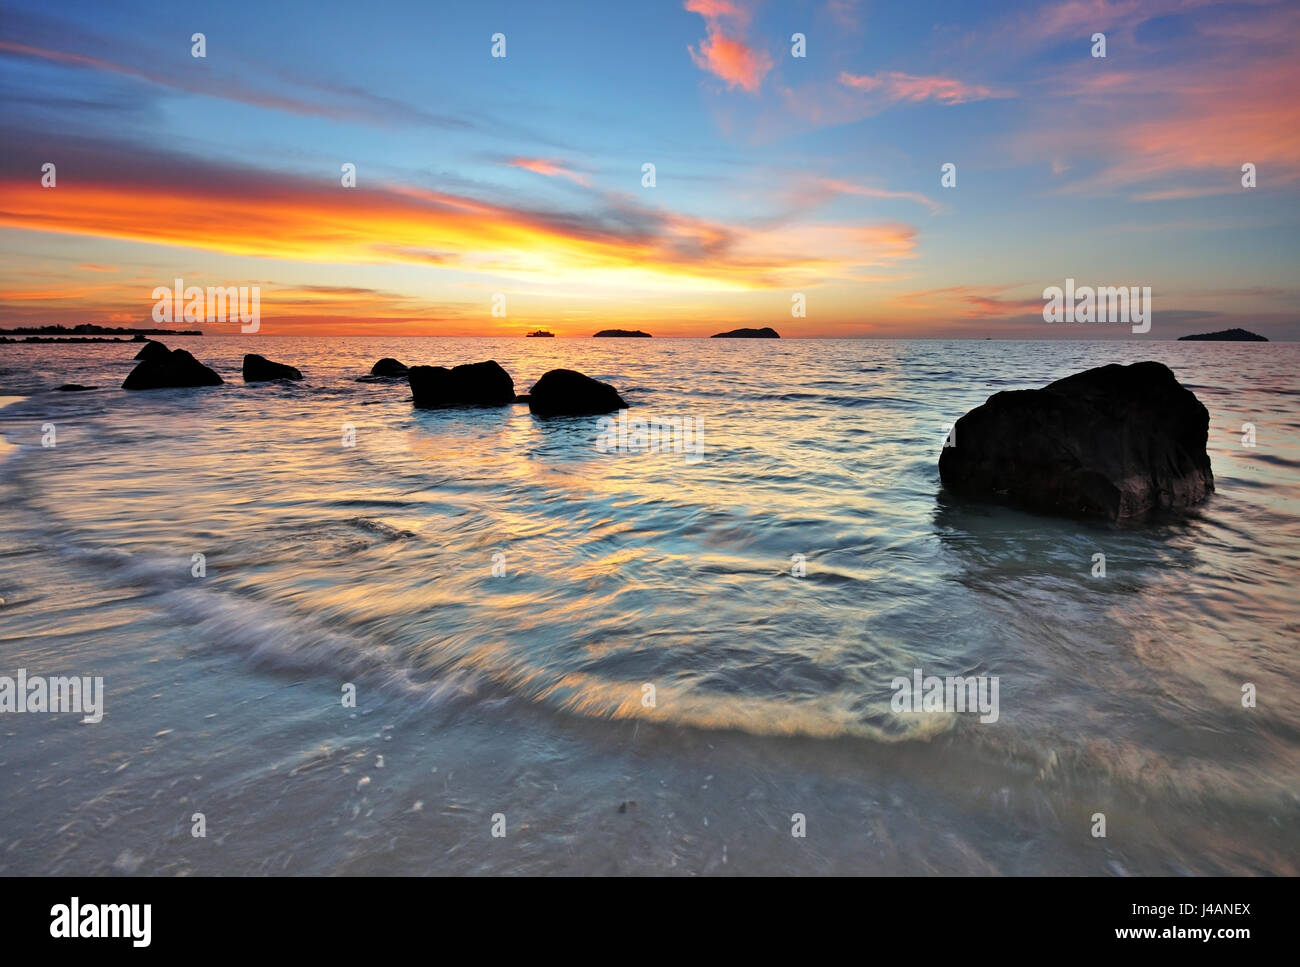 Beautiful sunset in a rocky beach in Kota Kinabalu, Sabah Borneo, Malaysia. - Stock Image